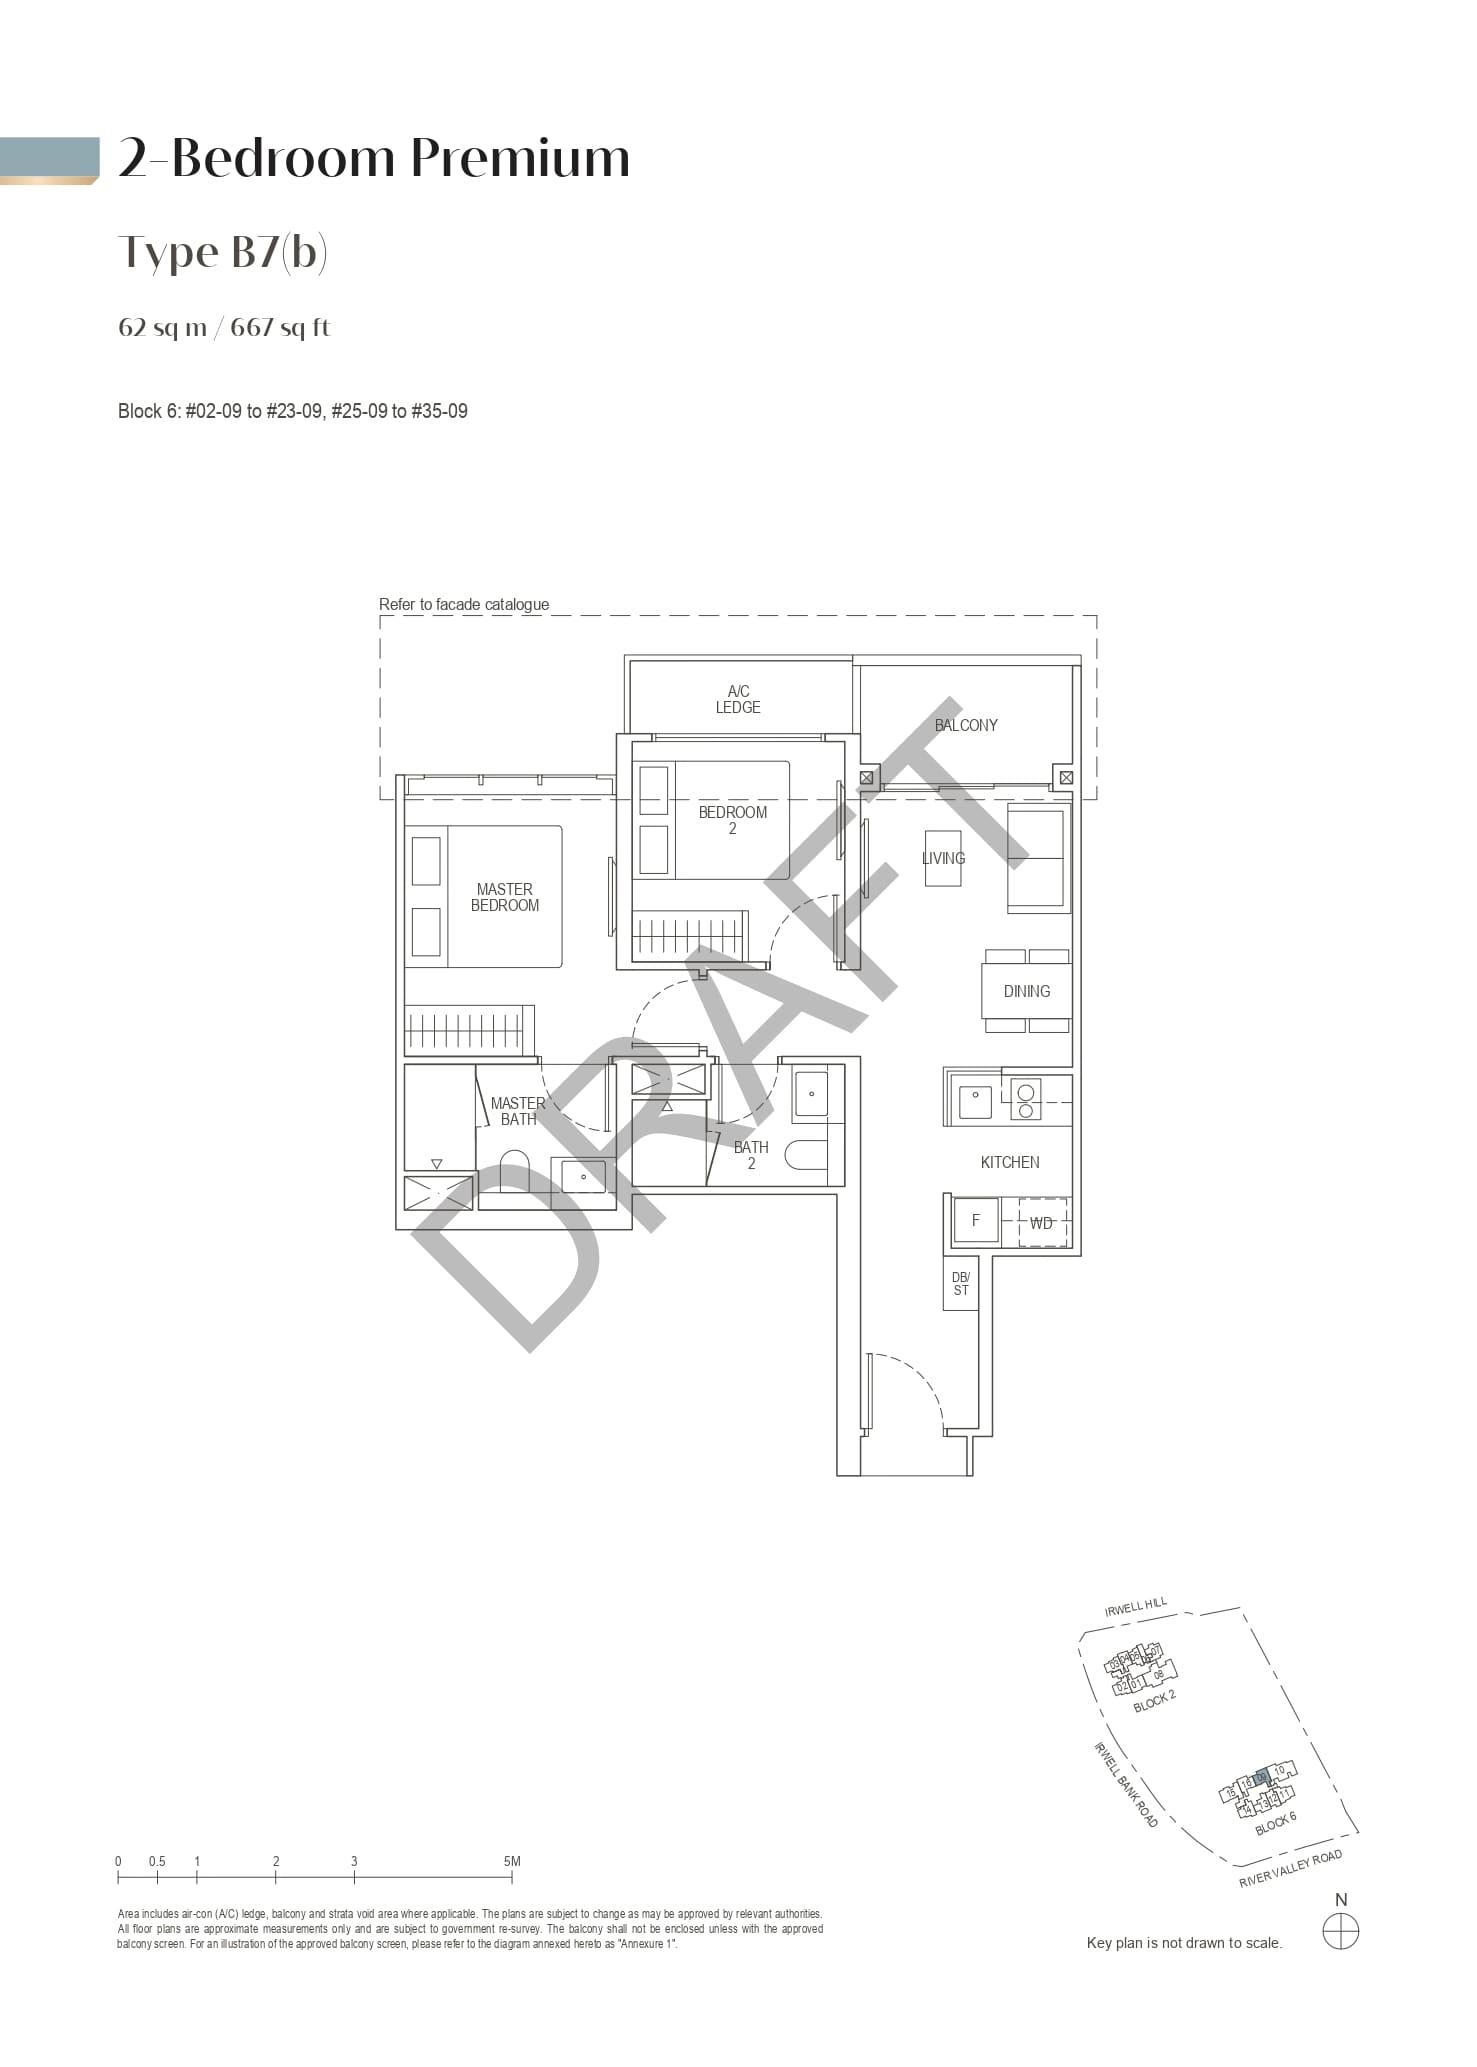 irwell-hill-residences-floor-plan-2-bedroom-premium-type-b7b